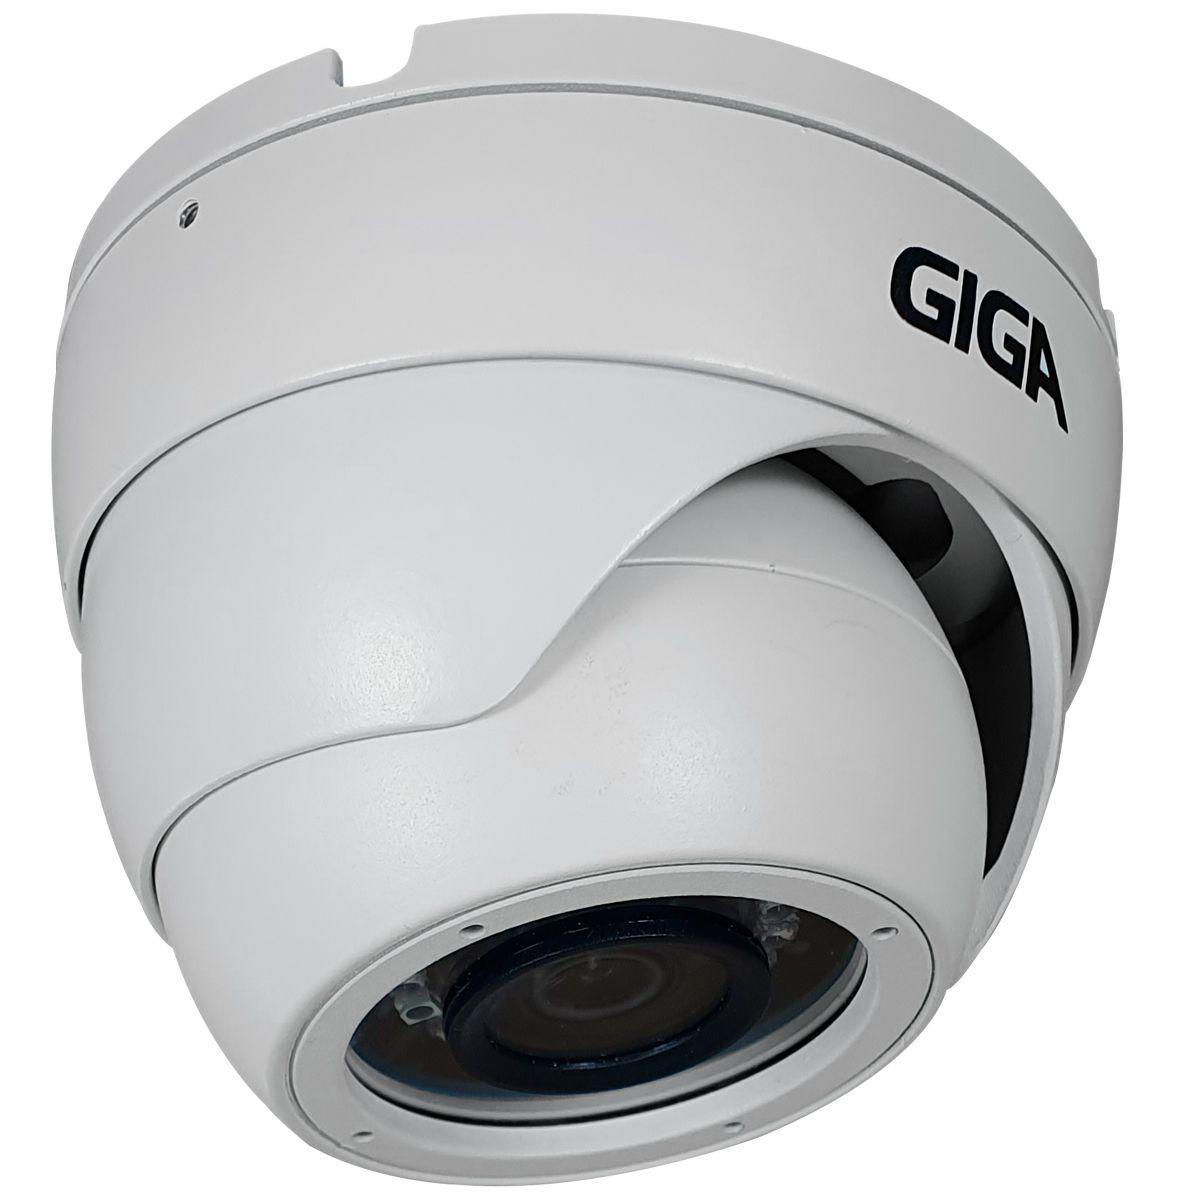 Kit HD 720p 06 Câmeras GS0021 + DVR Giga Security + HD 1TB Skygawk + Acessórios  - Tudo Forte